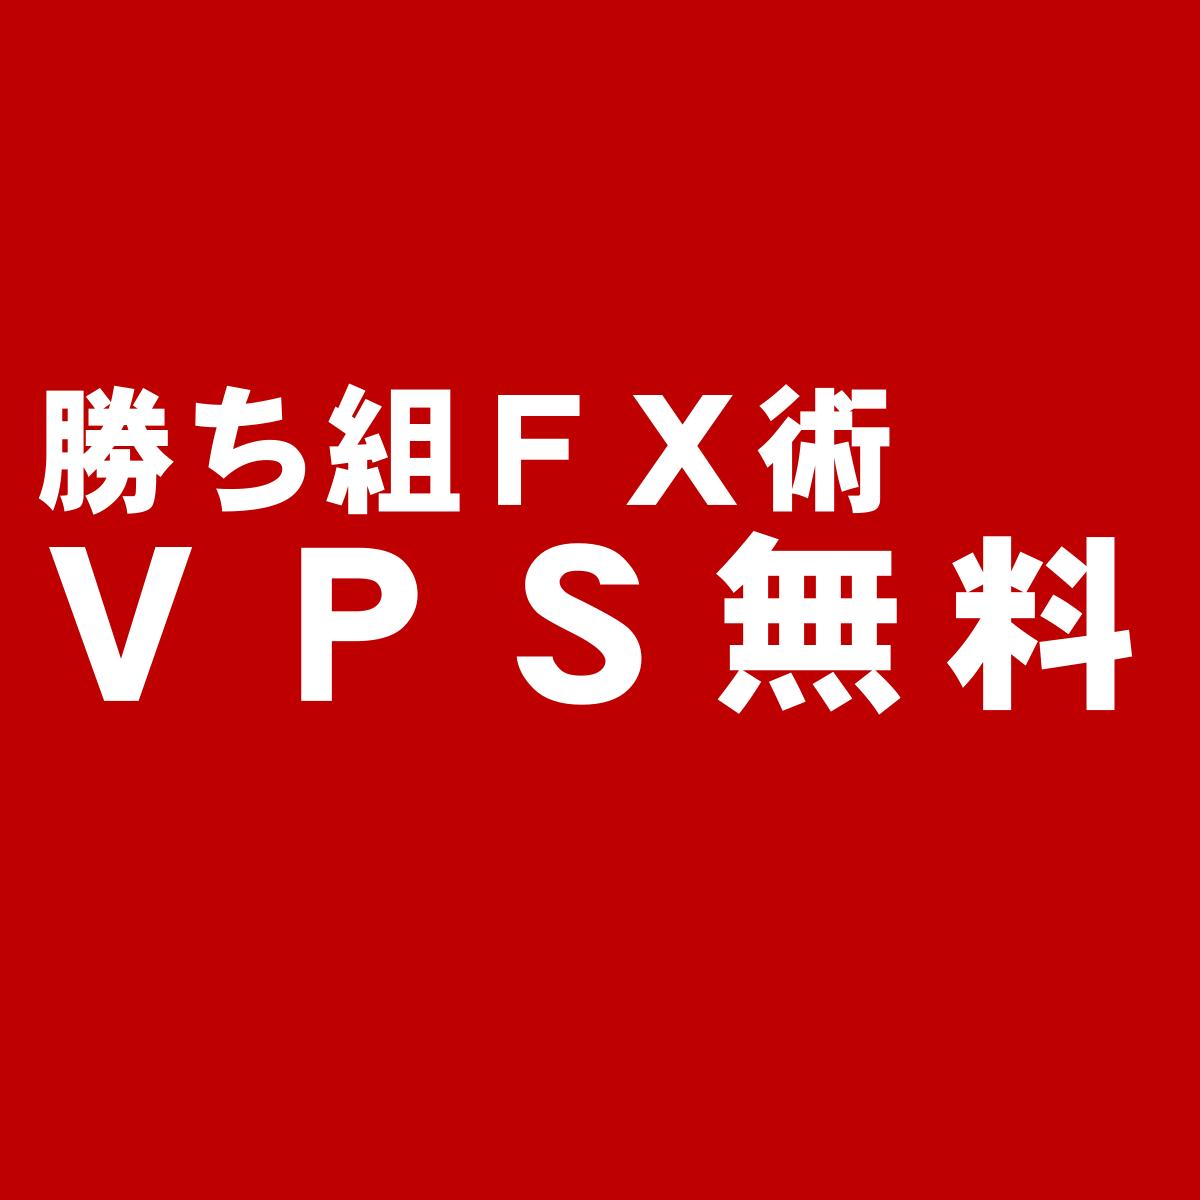 VPS無料